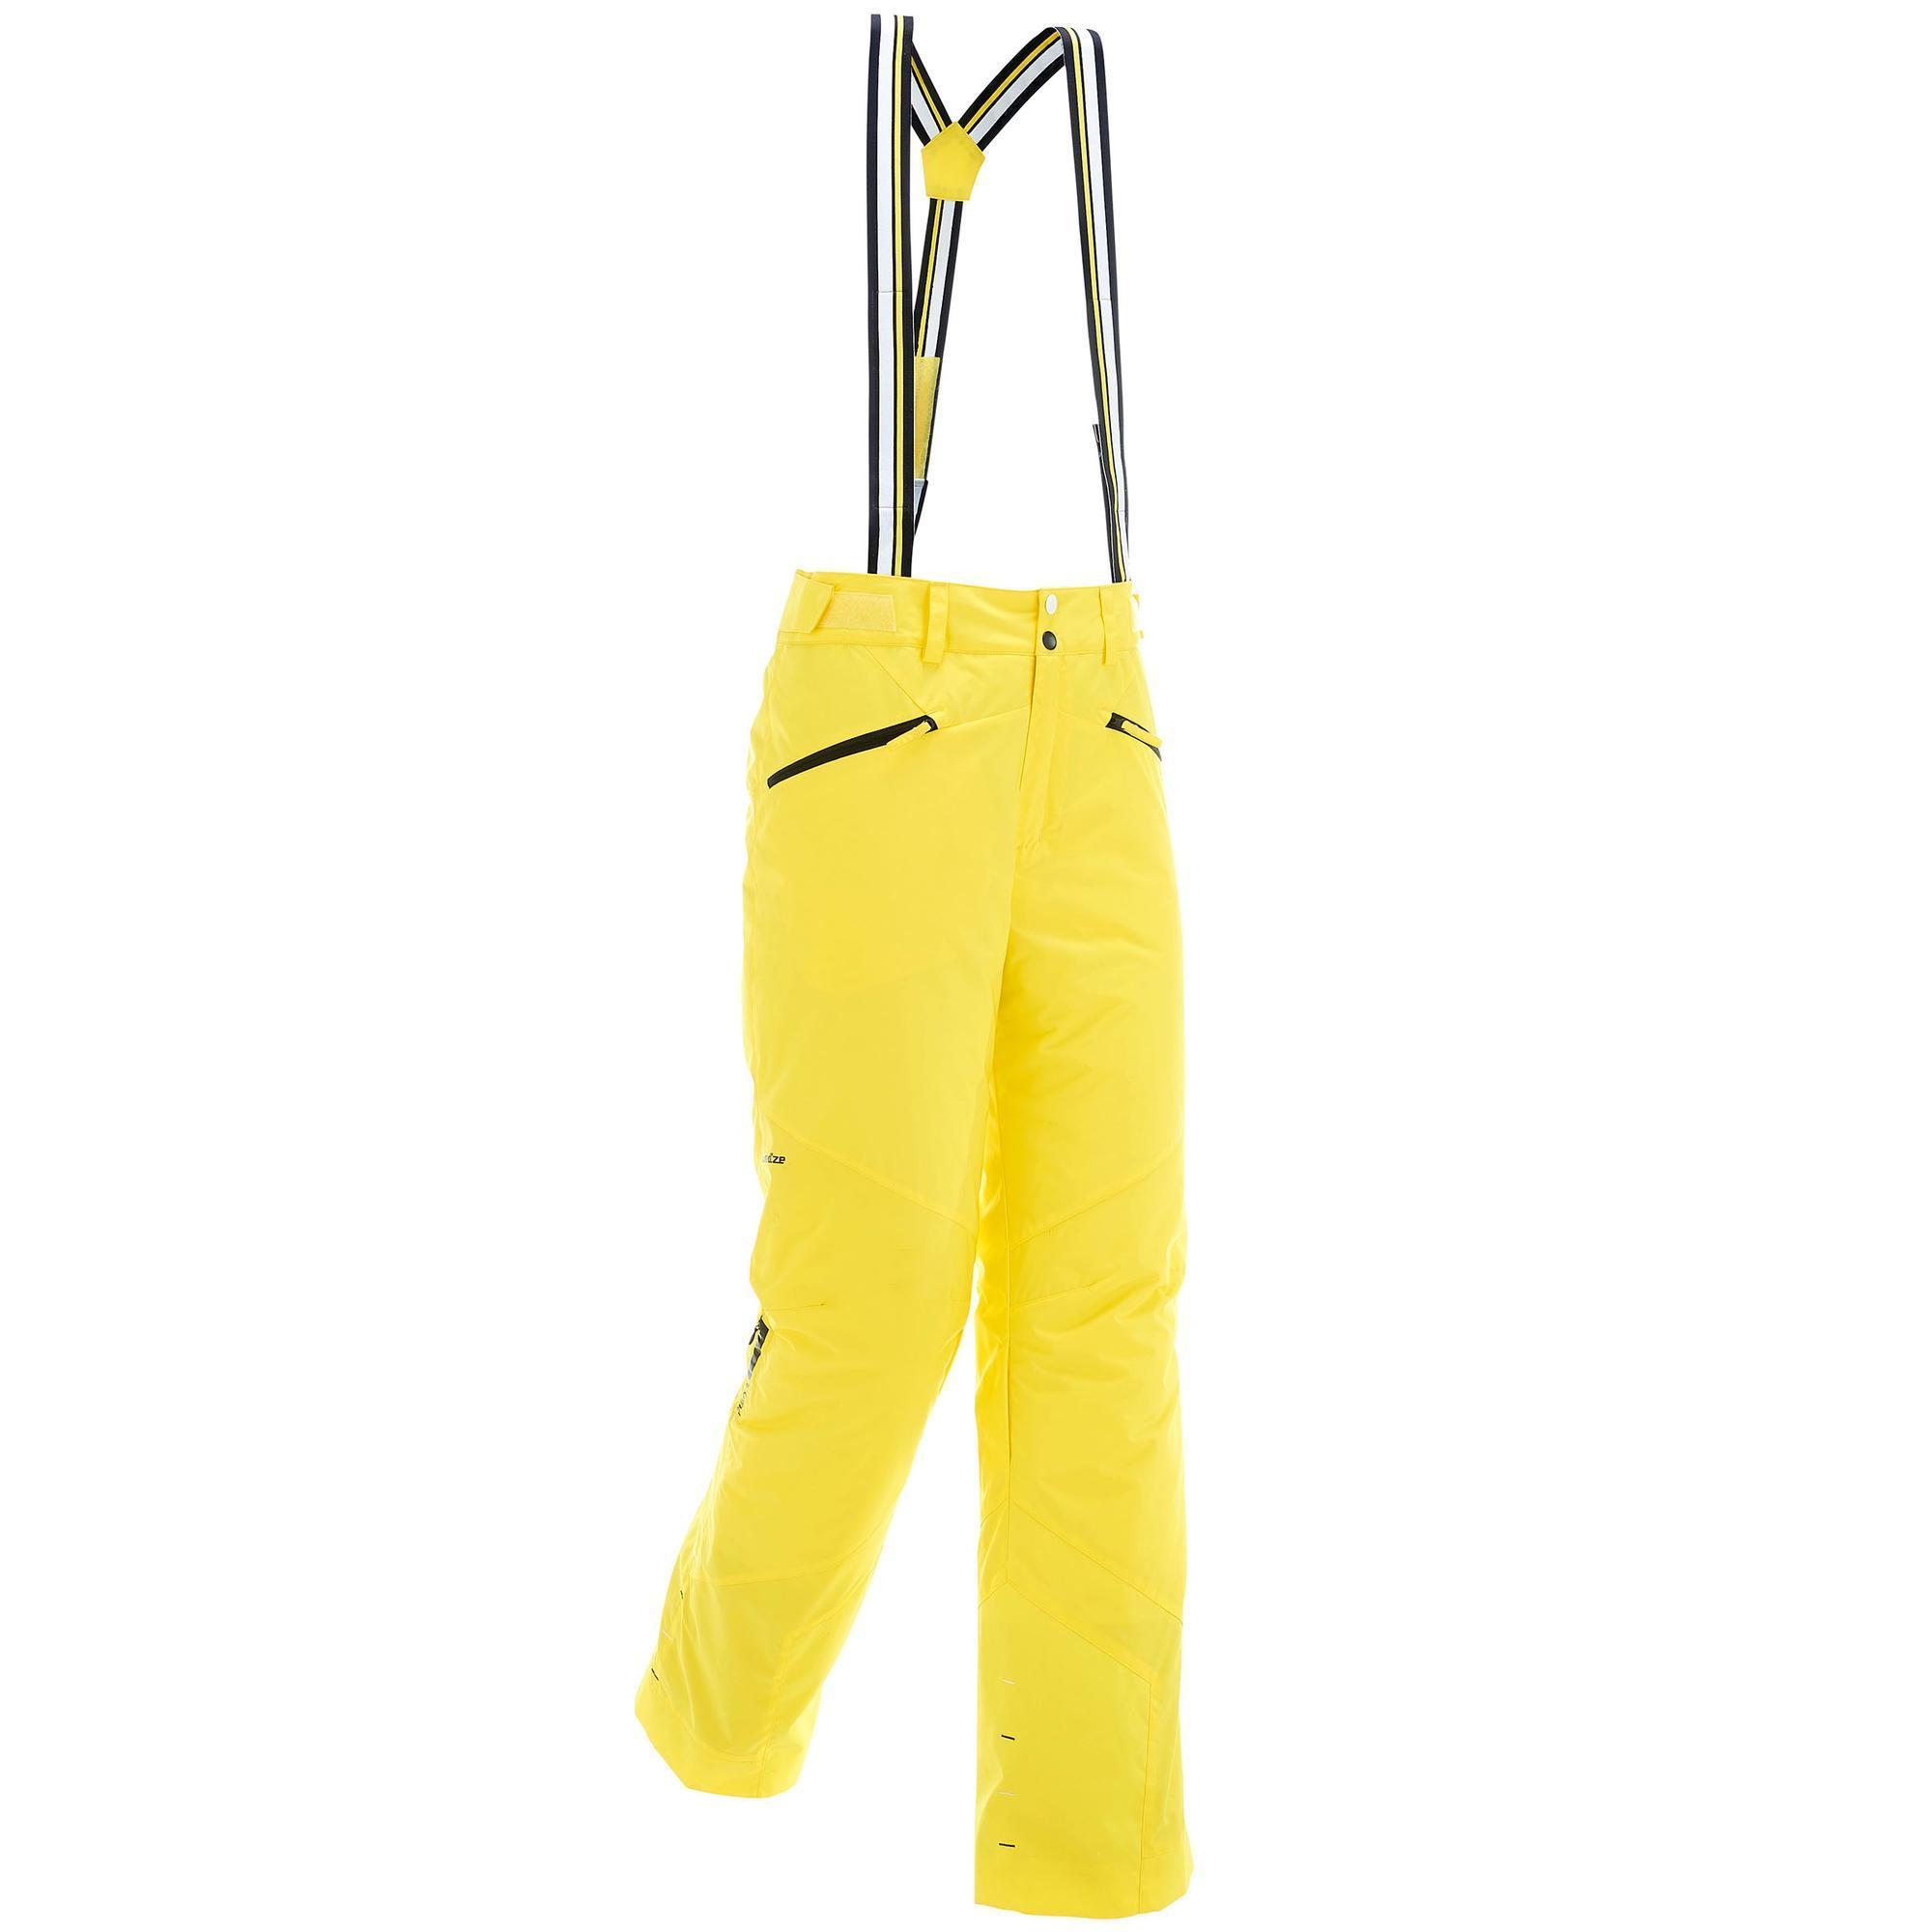 Ski Pantalons Pantalons Ski Decathlon Hommes De Ski Hommes De